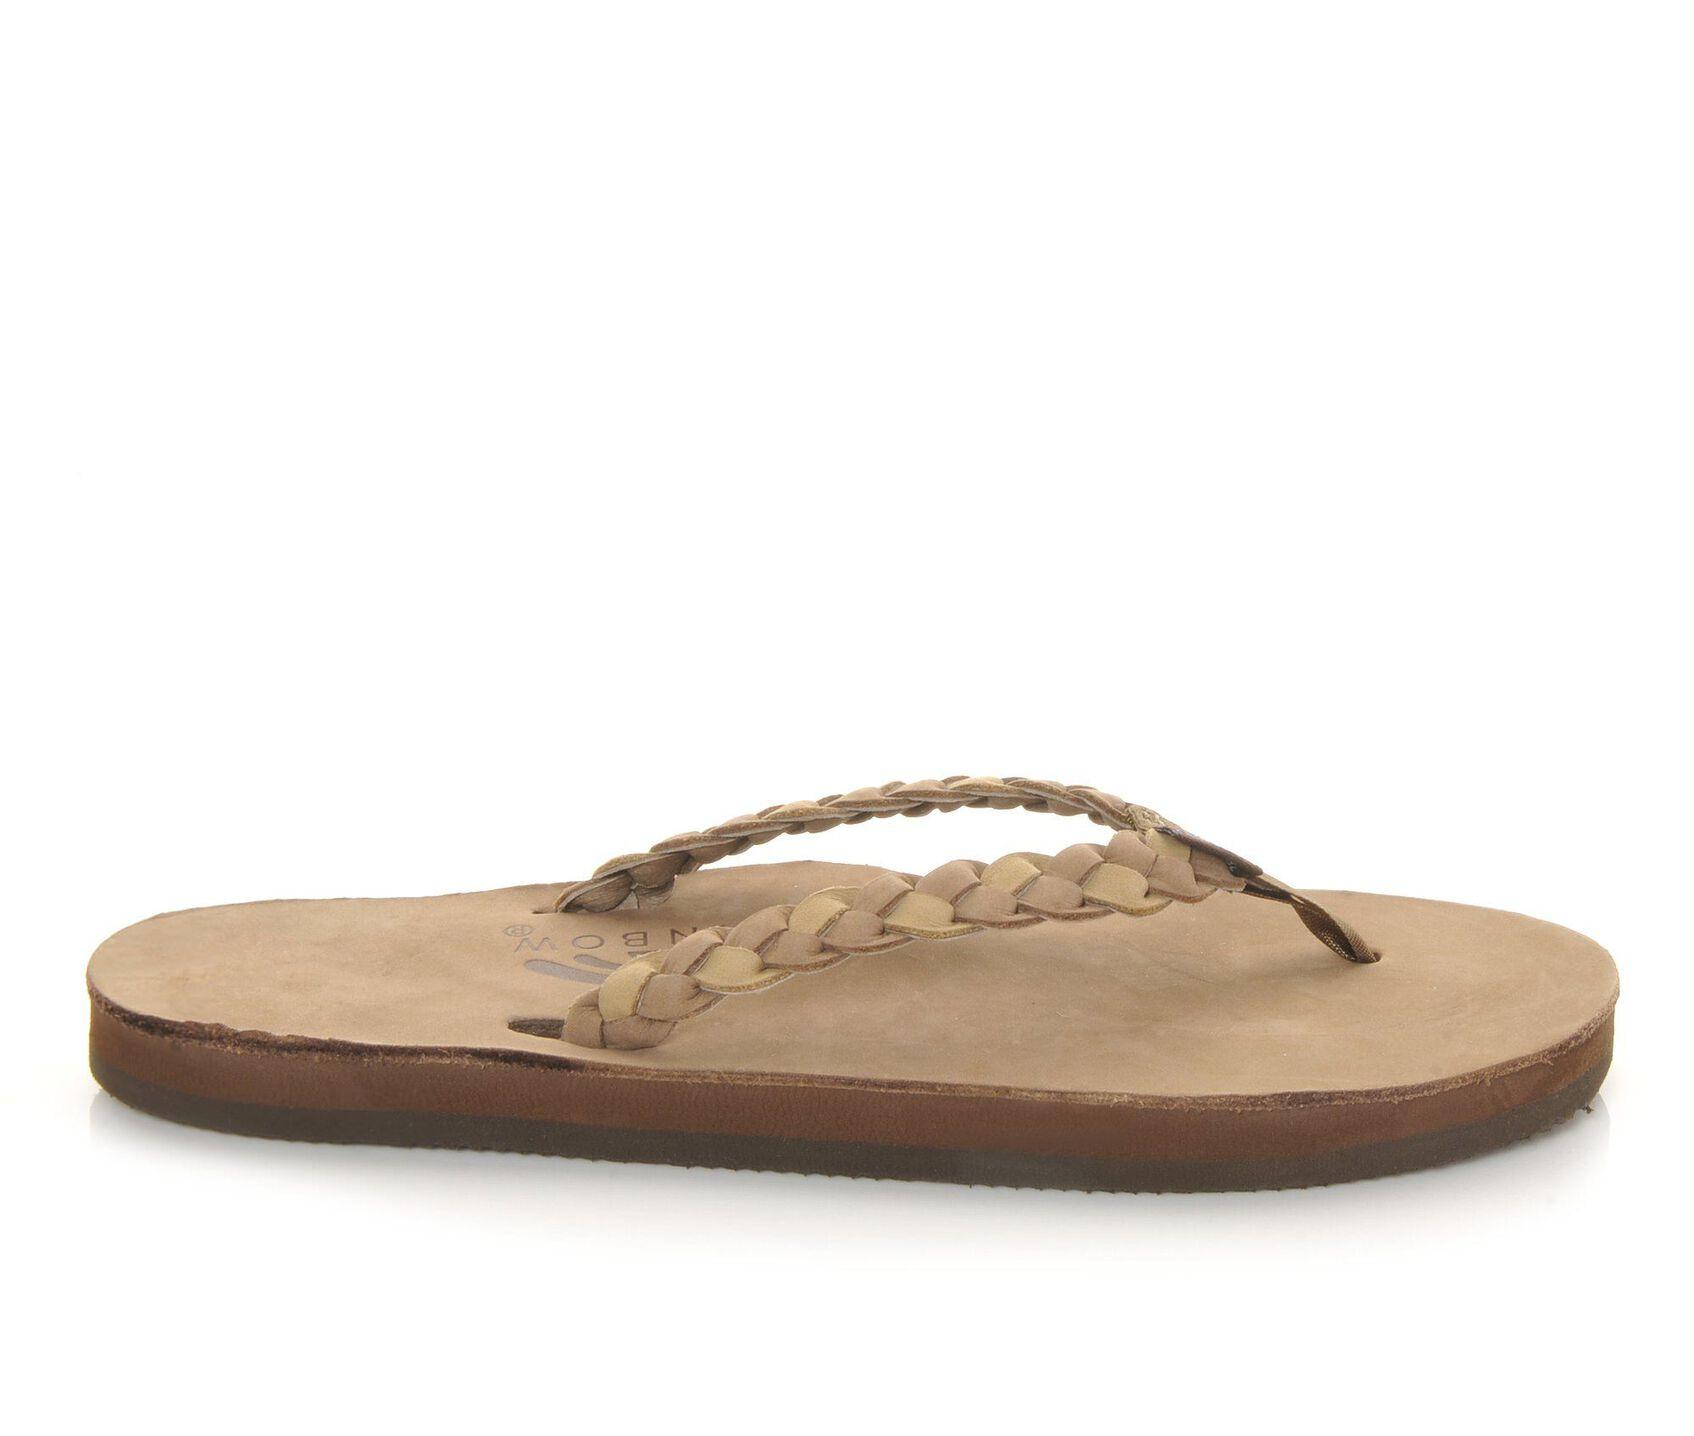 8d0591875 Women s Rainbow Sandals Twisted Sister Flip-Flops